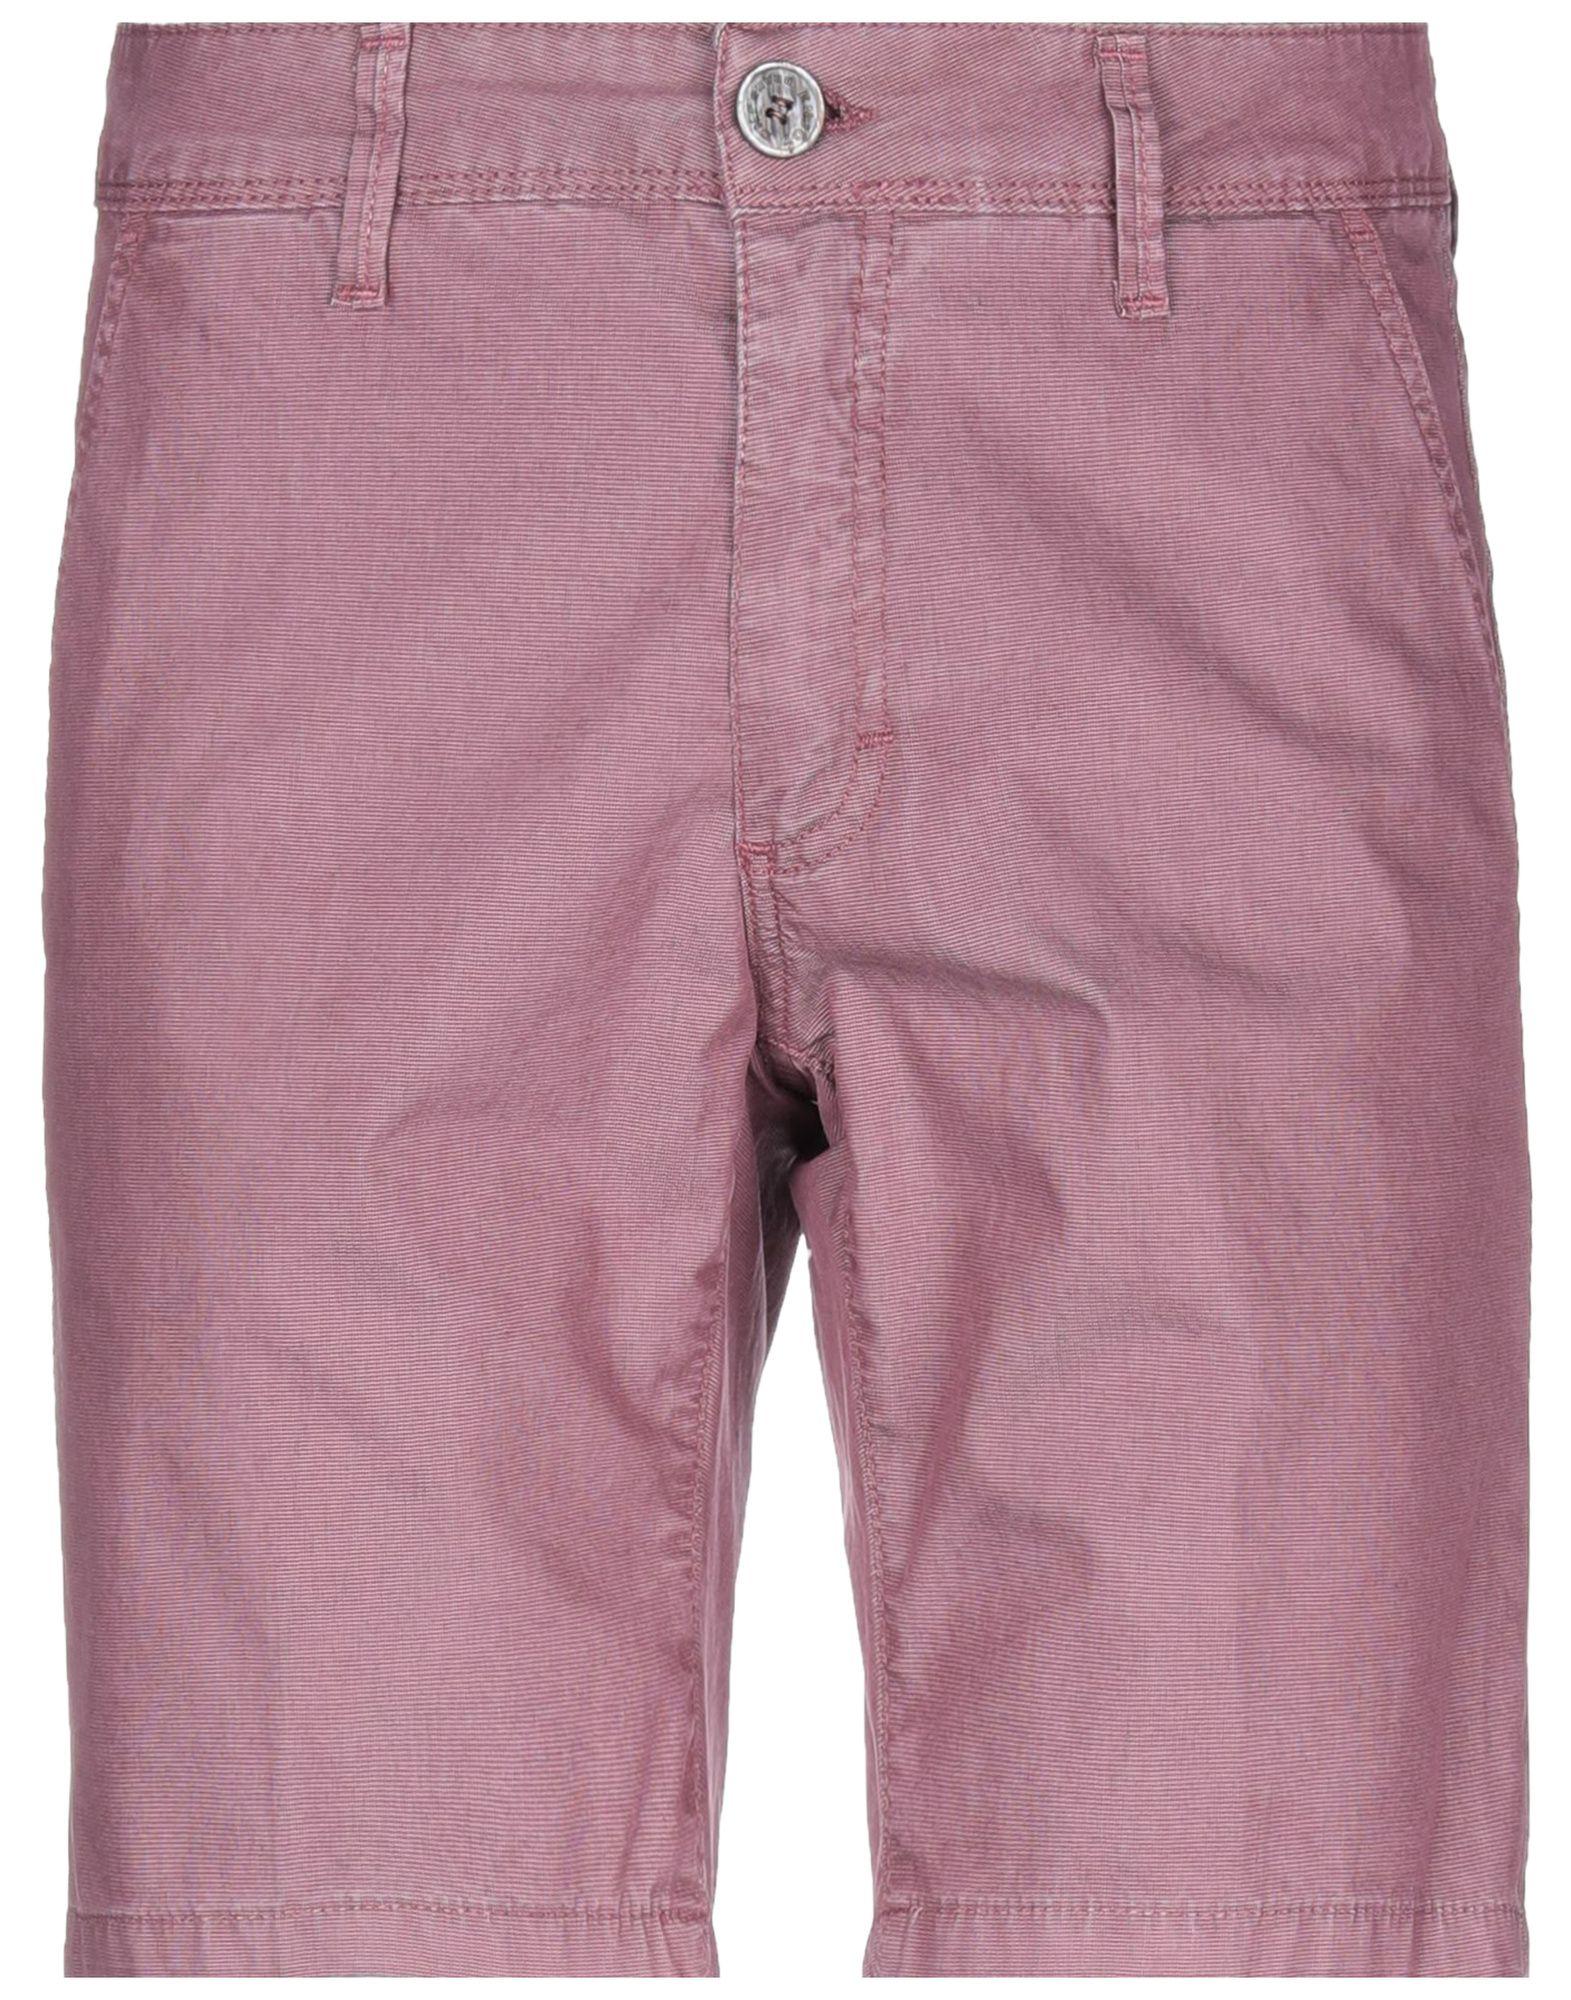 ENJOY BRAND+JEANS Повседневные шорты new summer casual cotton men short jeans fashion brand men s bermuda boardshorts jeans shorts mens ripped plus size 28 36